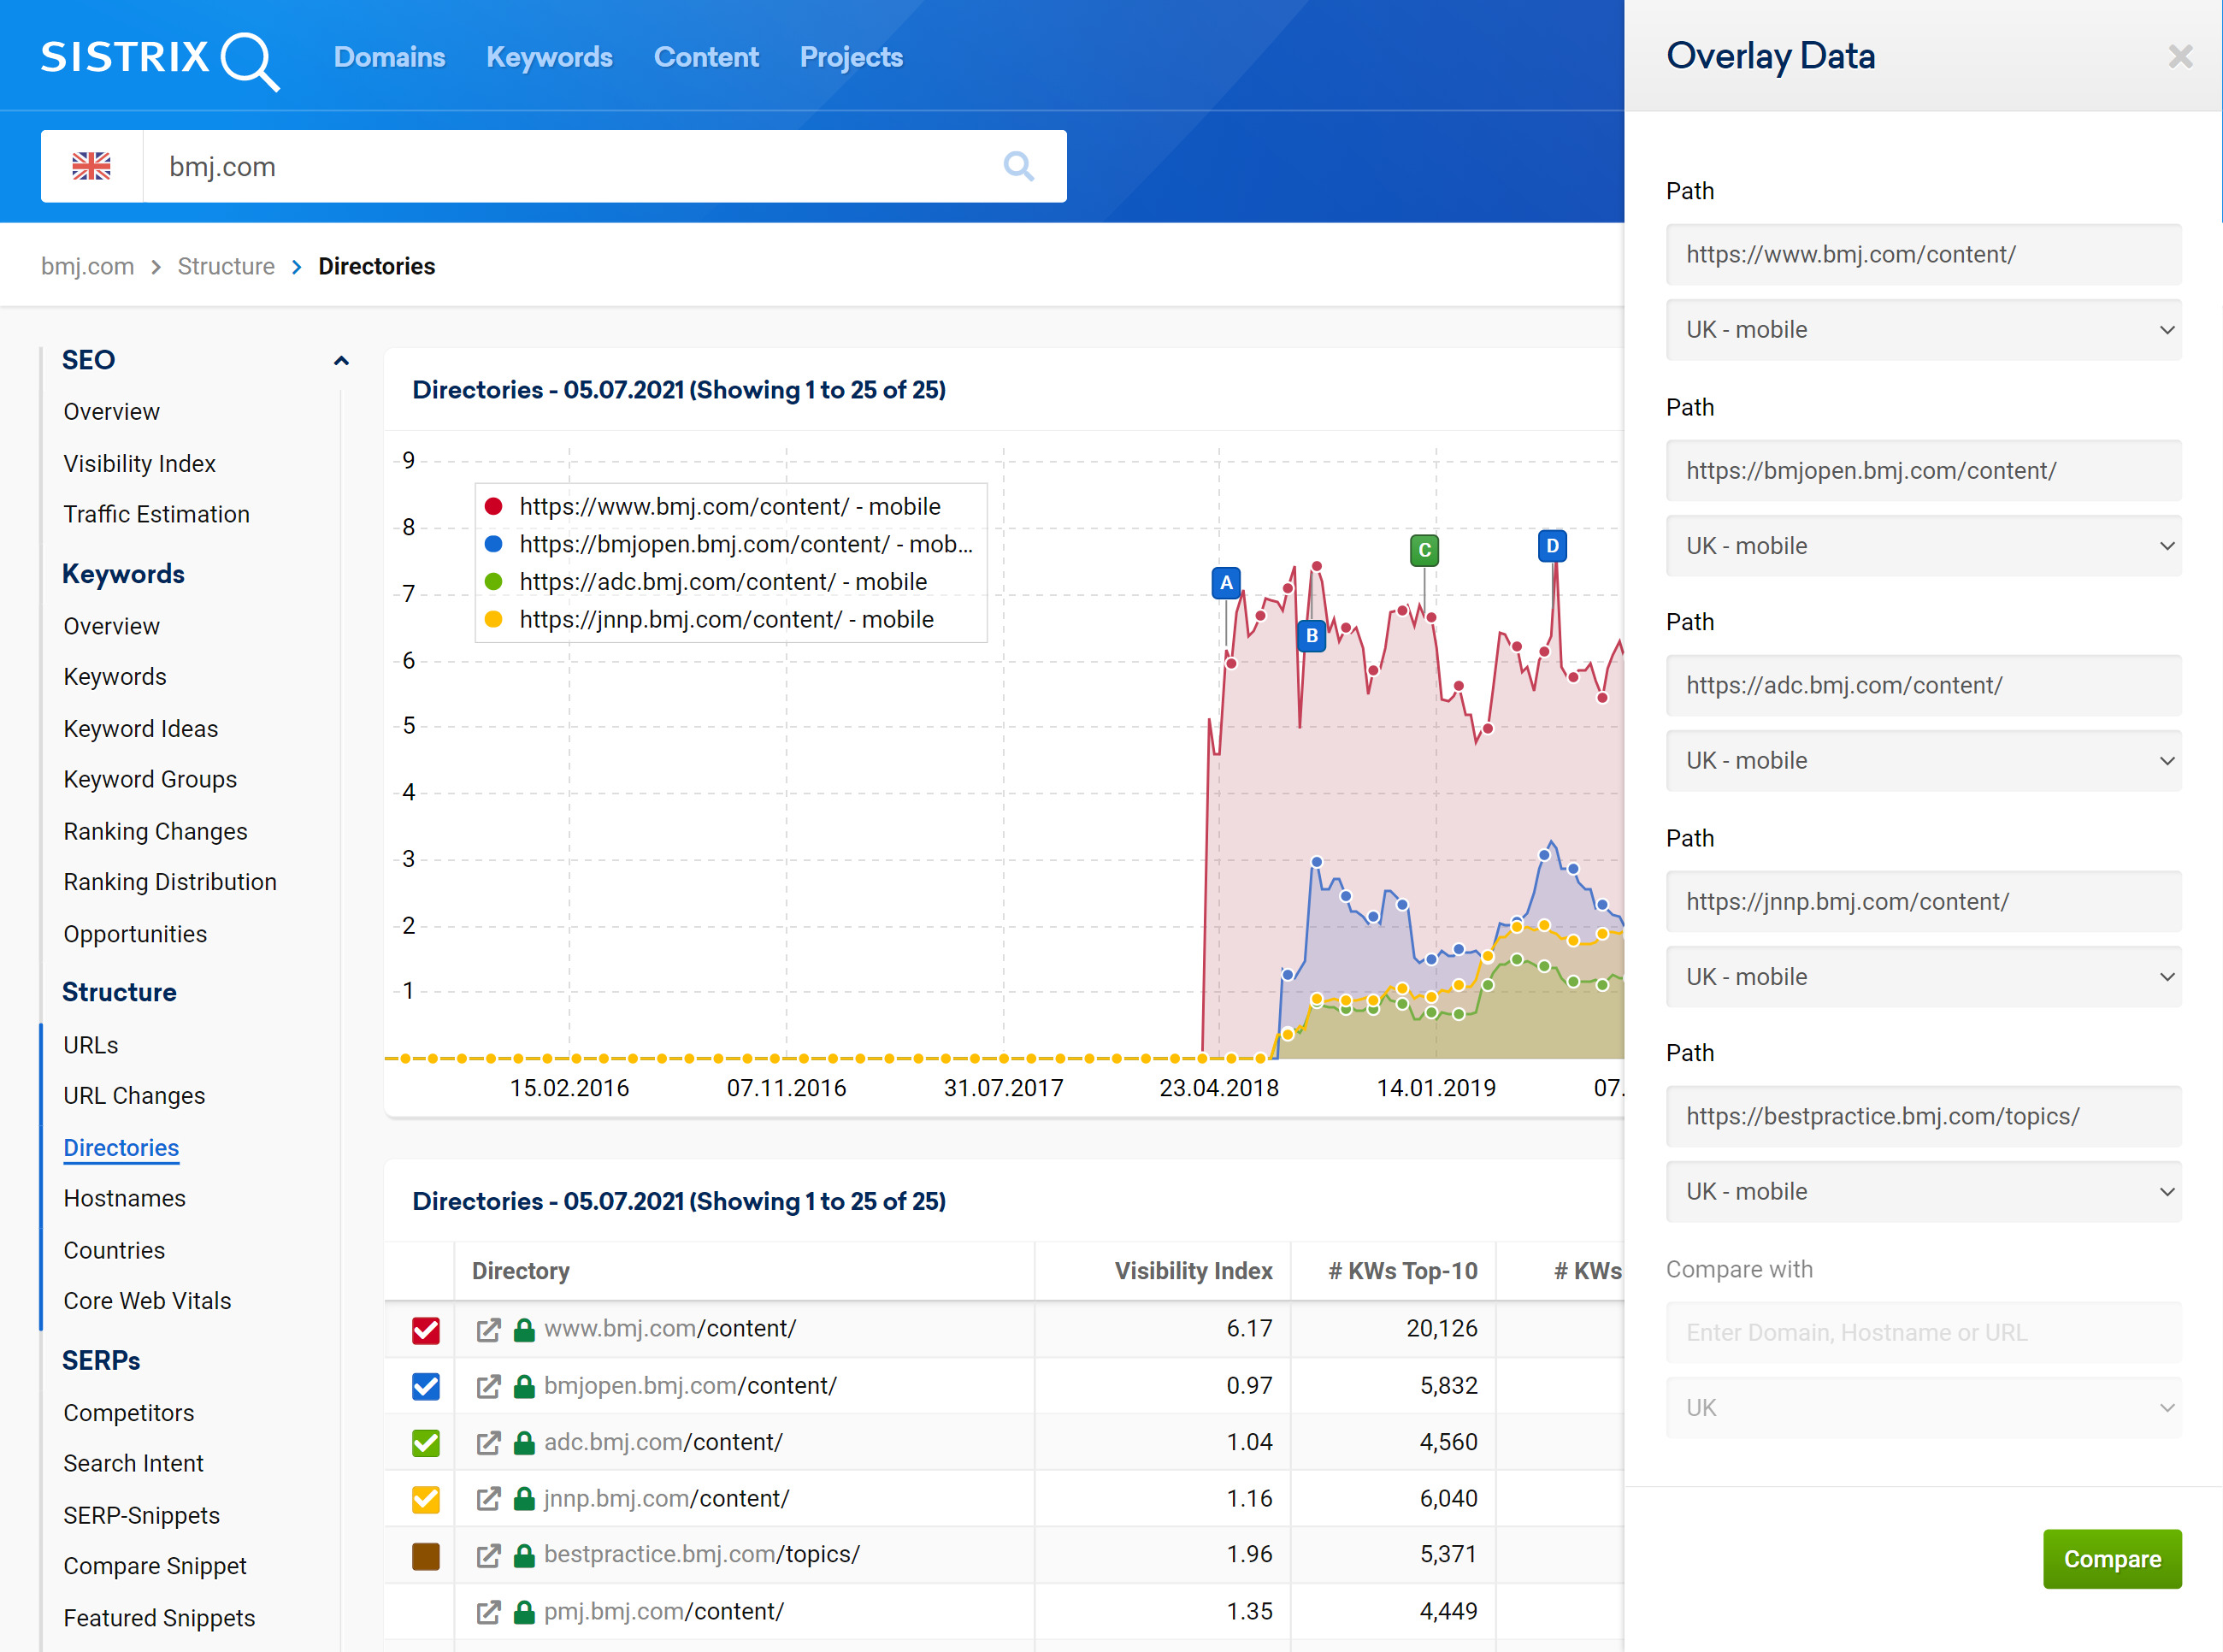 Overlay data example